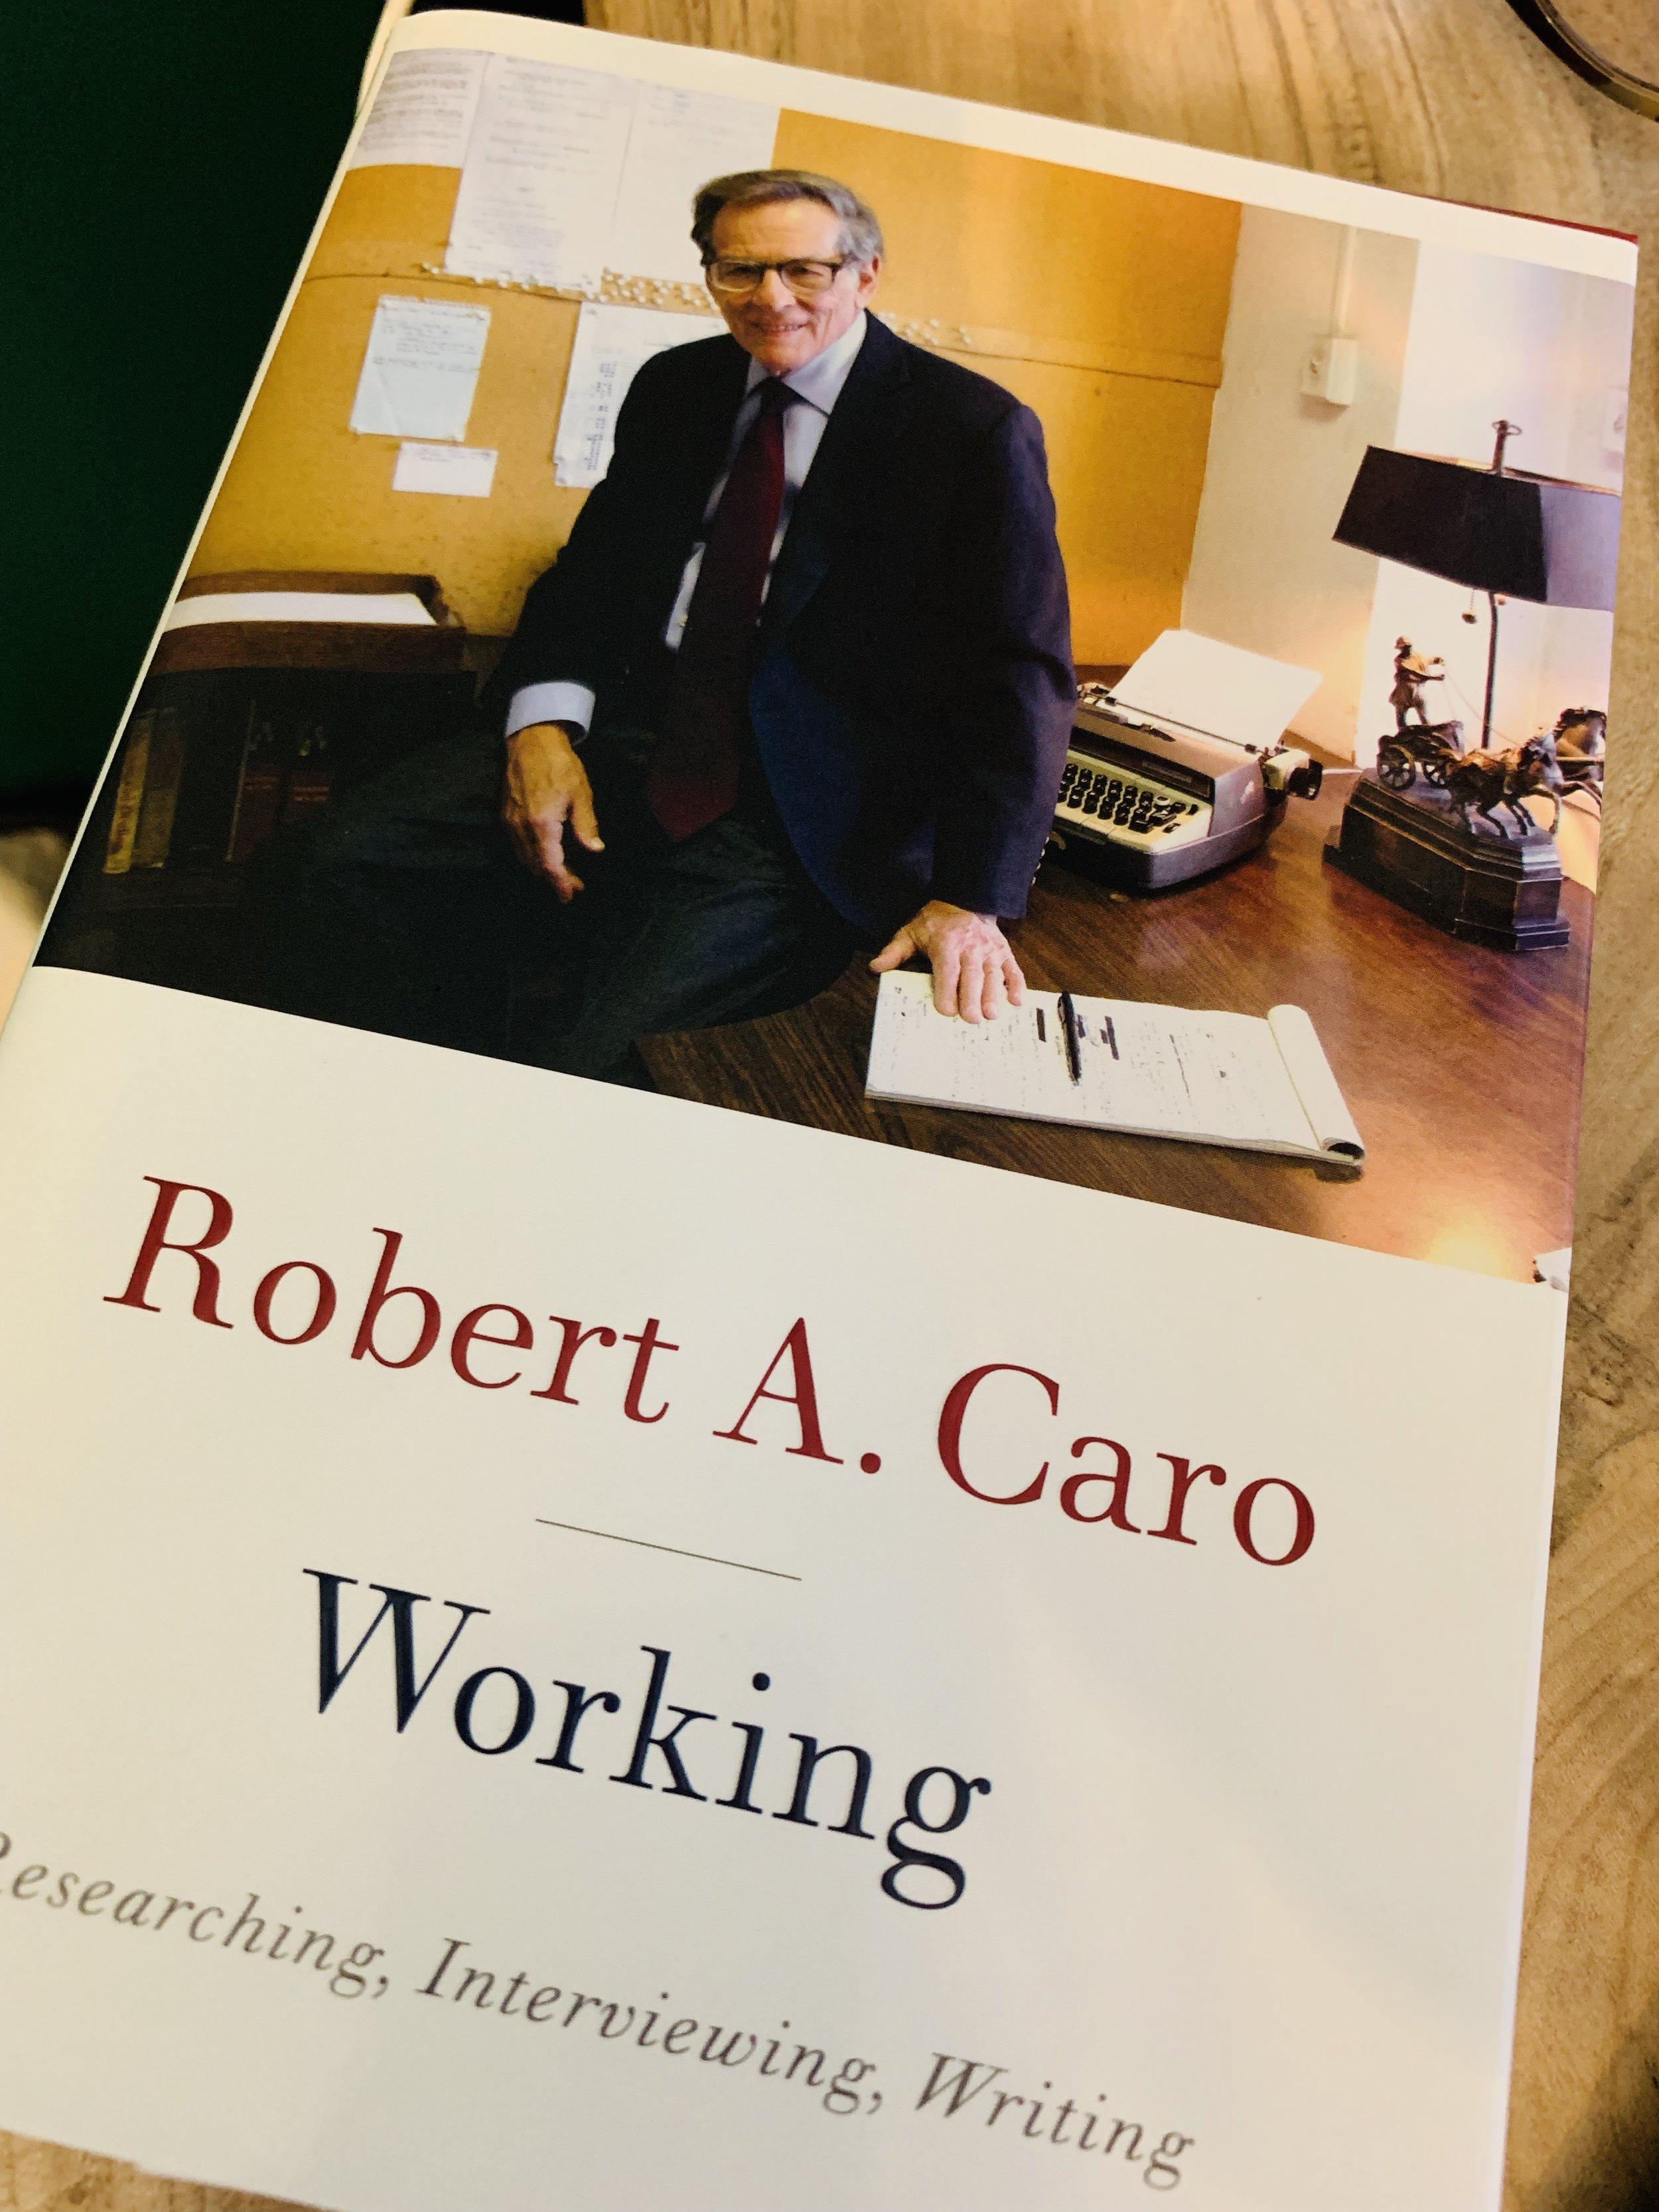 Robert A Caro Working